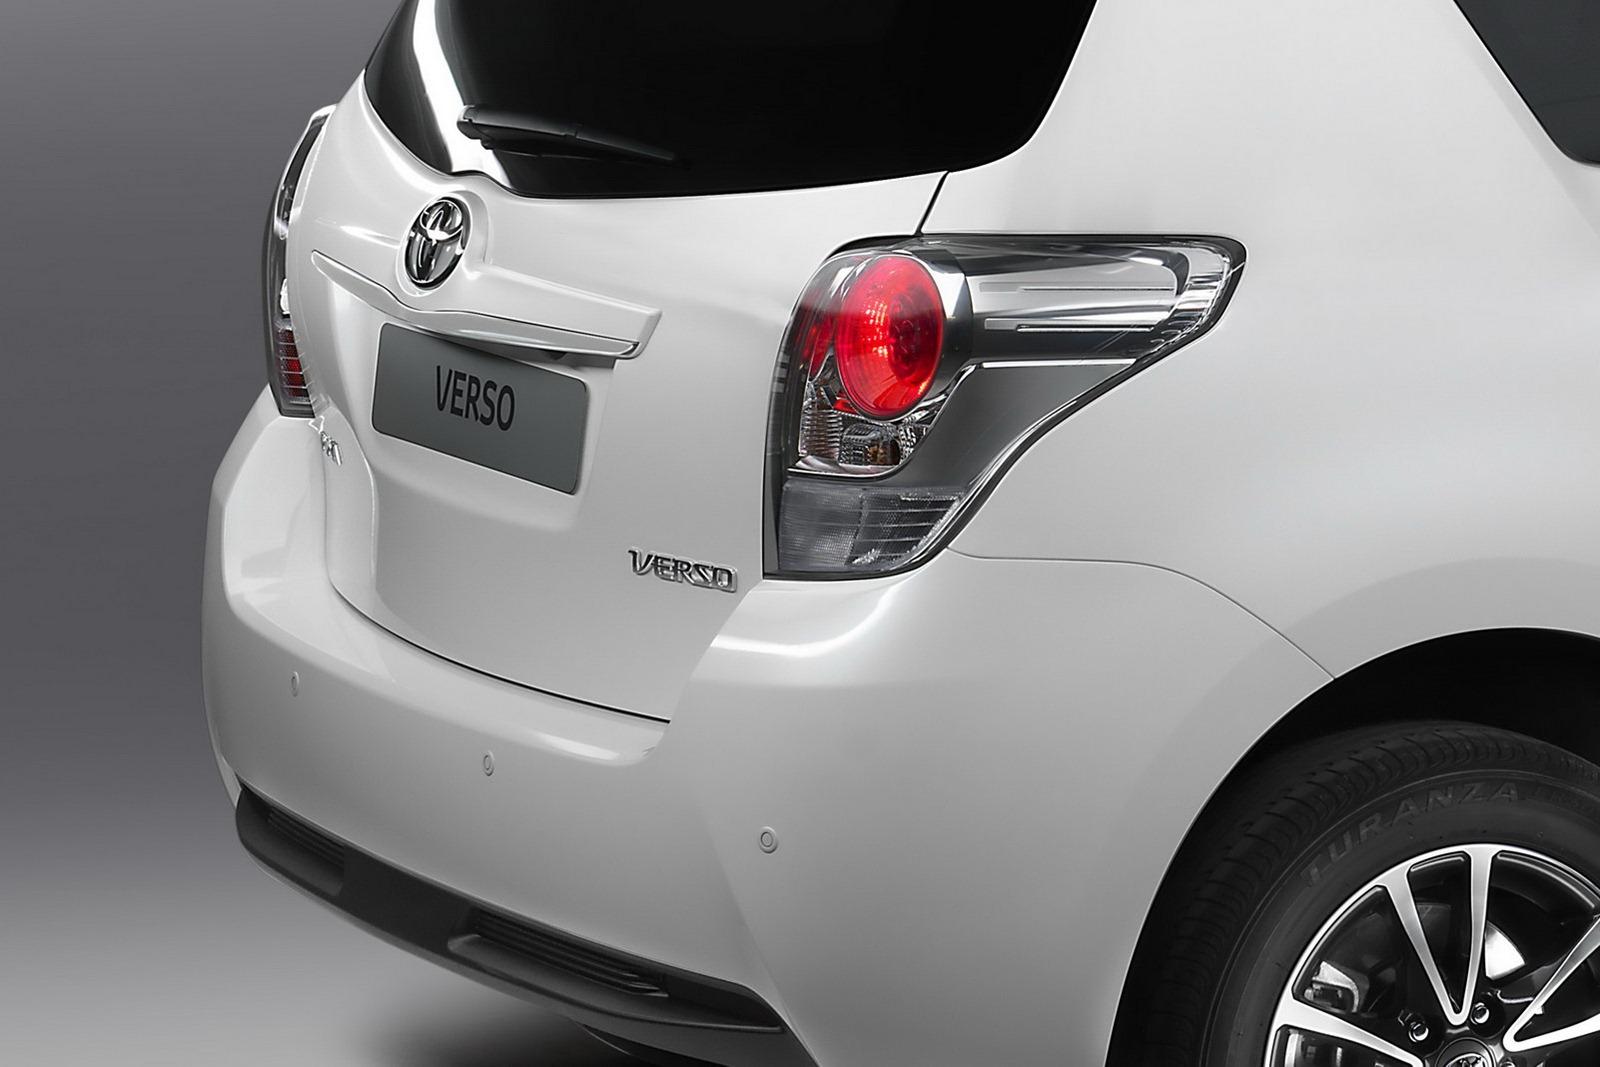 2013 Toyota Verso Mpv Gets A Facelift Autoevolution